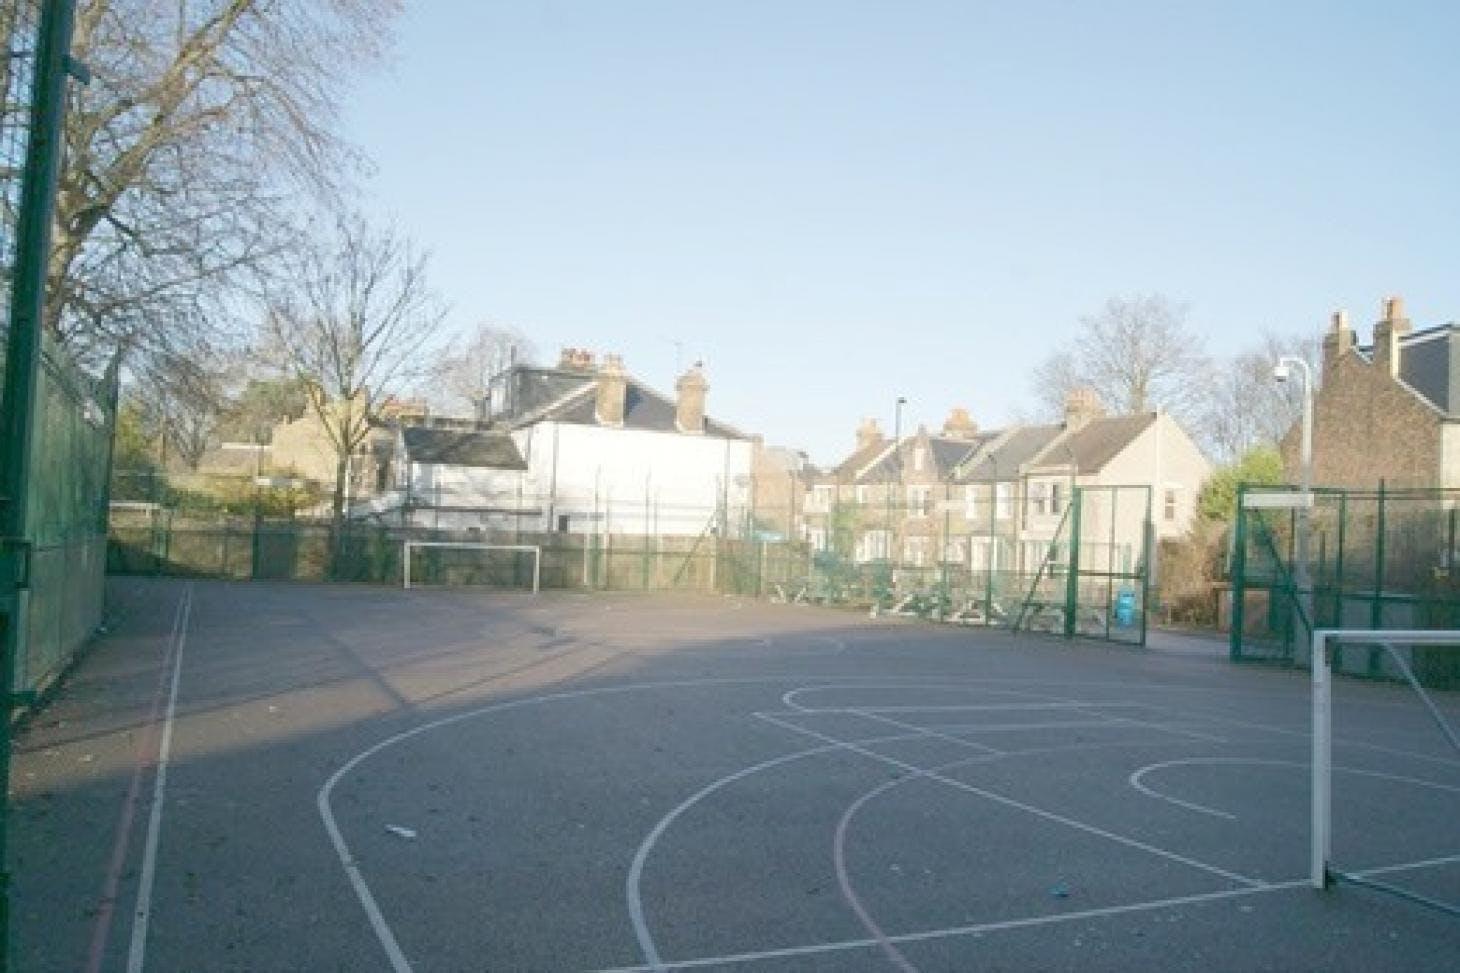 Trinity Secondary School, Lewisham 5 a side | Concrete football pitch